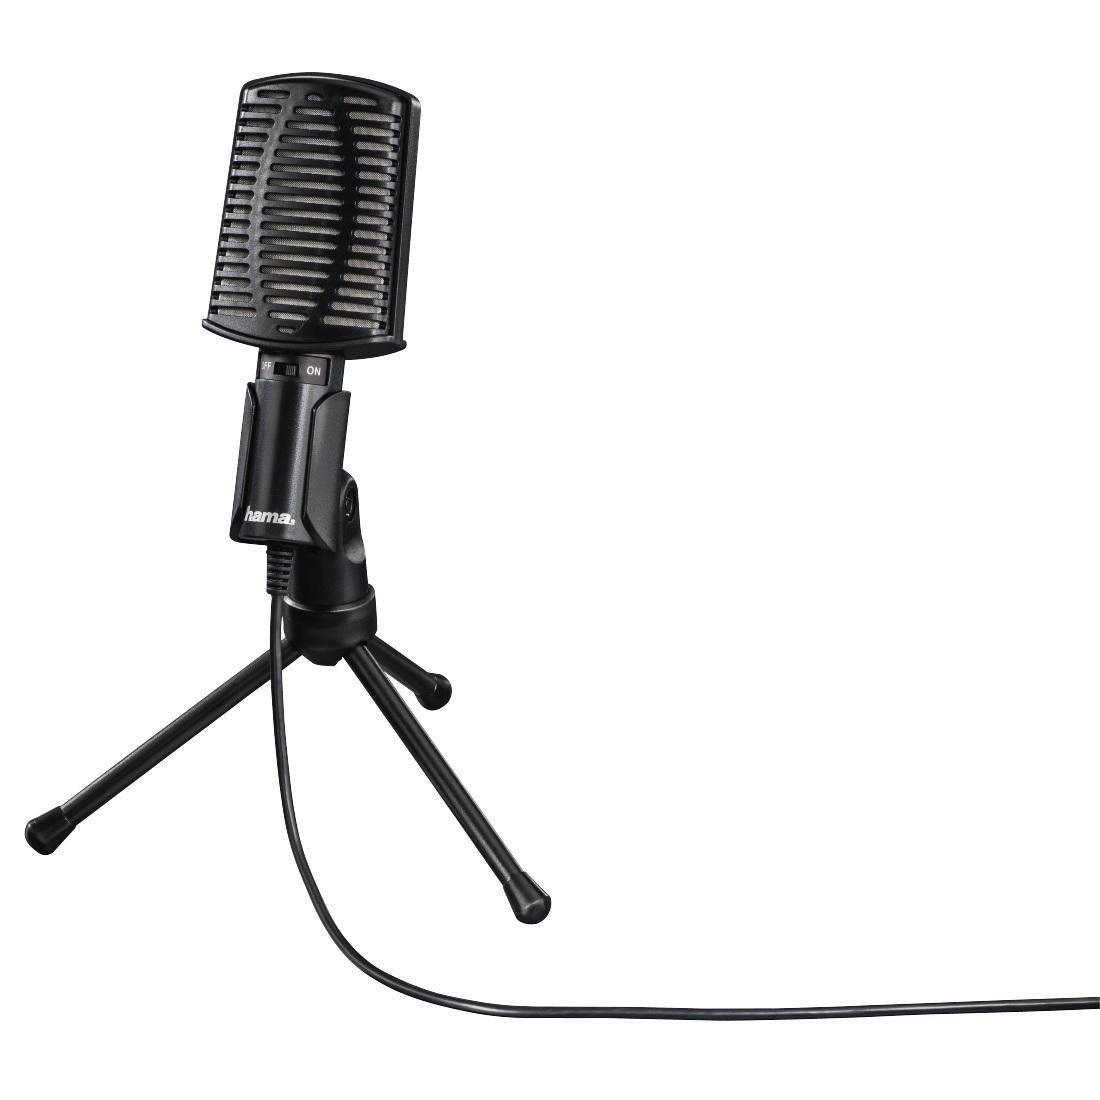 Настолен микрофон HAMA MIC-USB Allround, за PC/лаптоп, USB, Черен